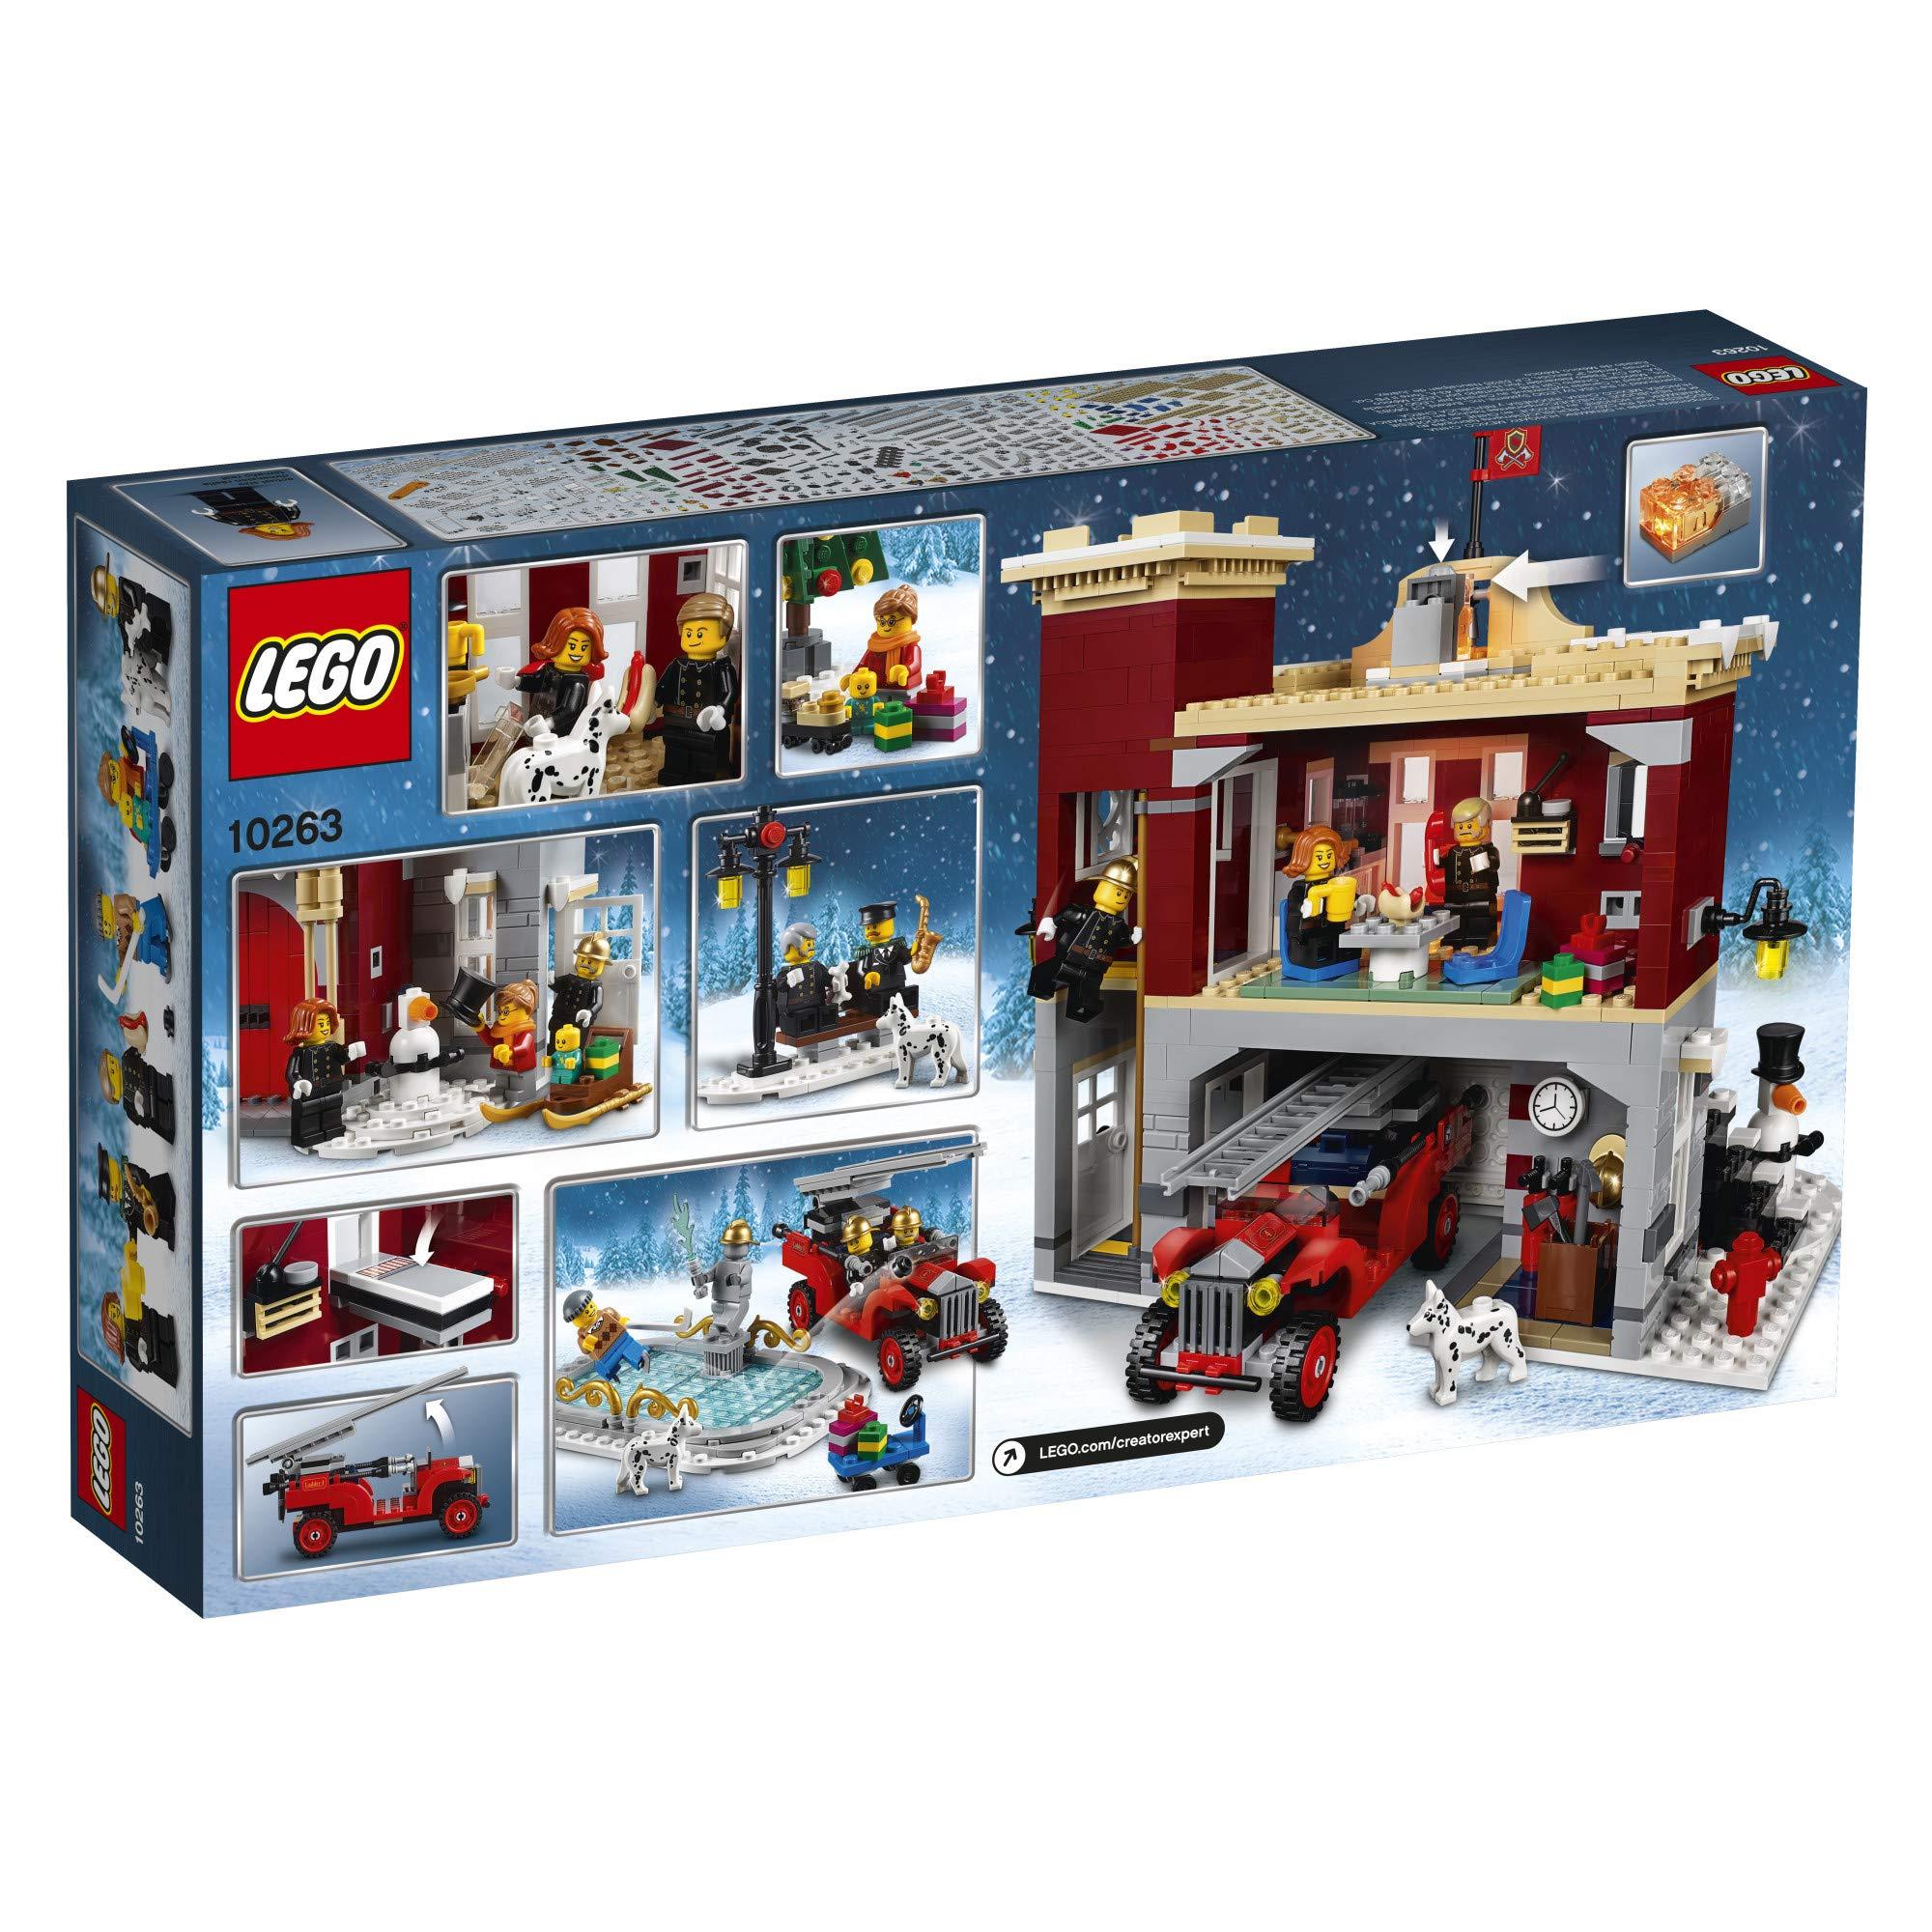 lego creator expert winter village fire station 10263 building kit 2019 1166 pieces. Black Bedroom Furniture Sets. Home Design Ideas